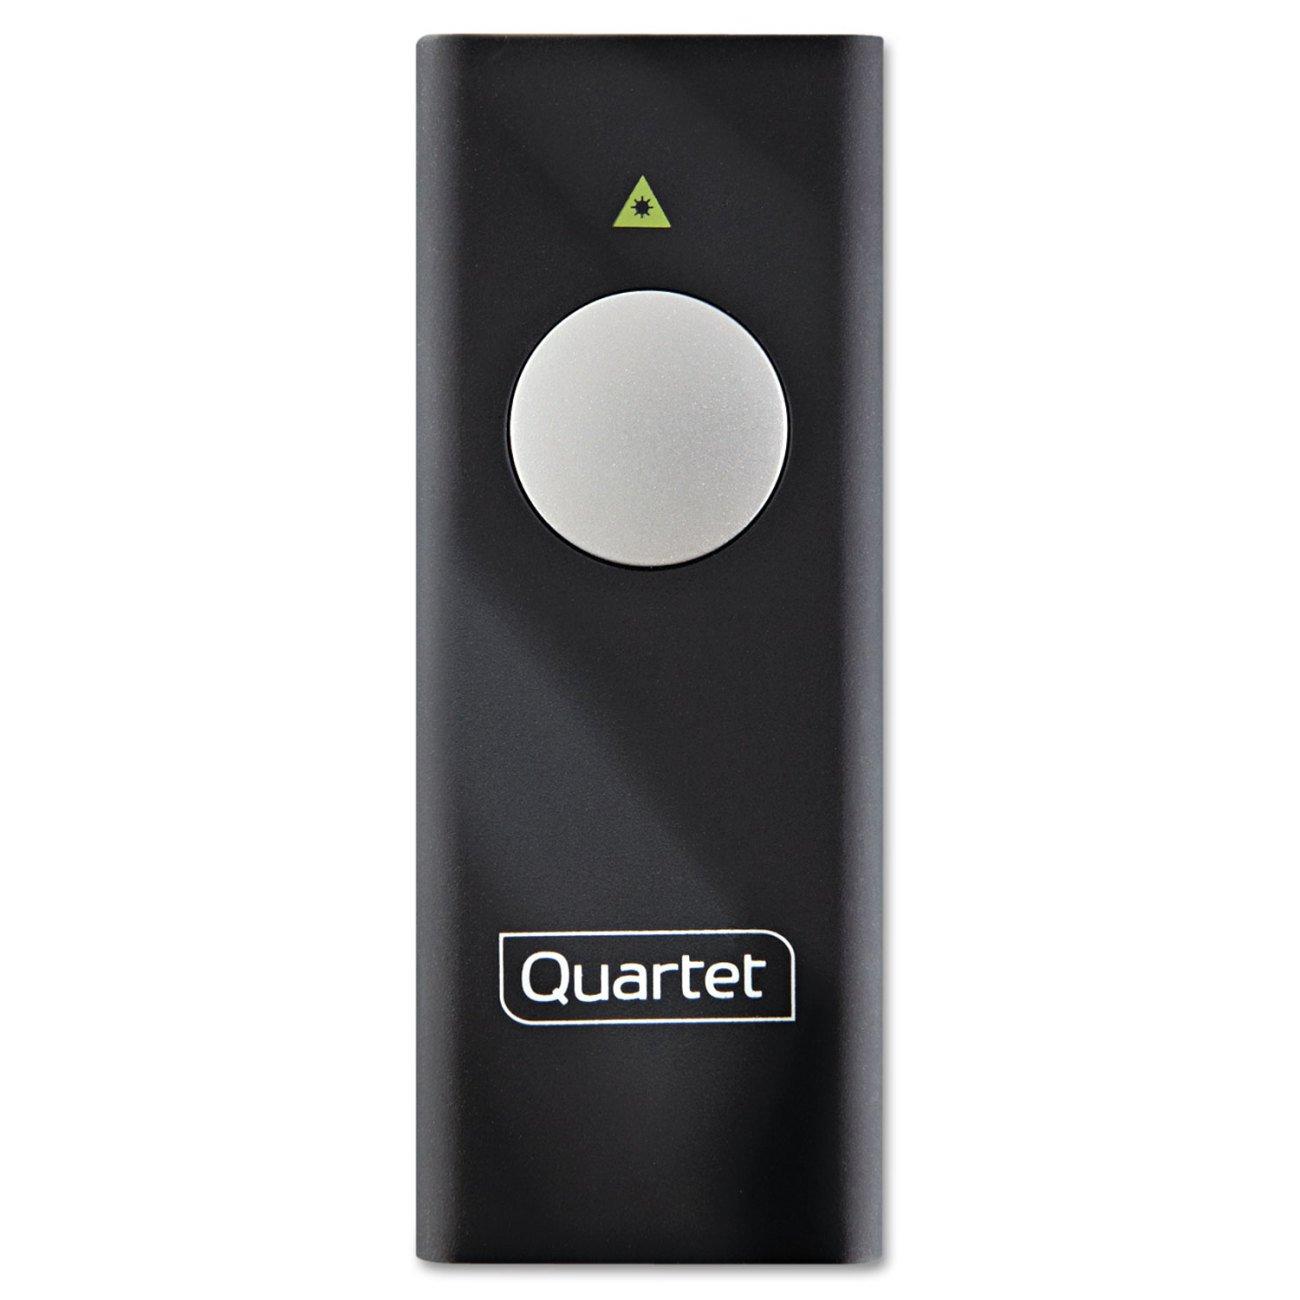 Quartet Slimline Laser Pointer, Black (84501) by Quartet